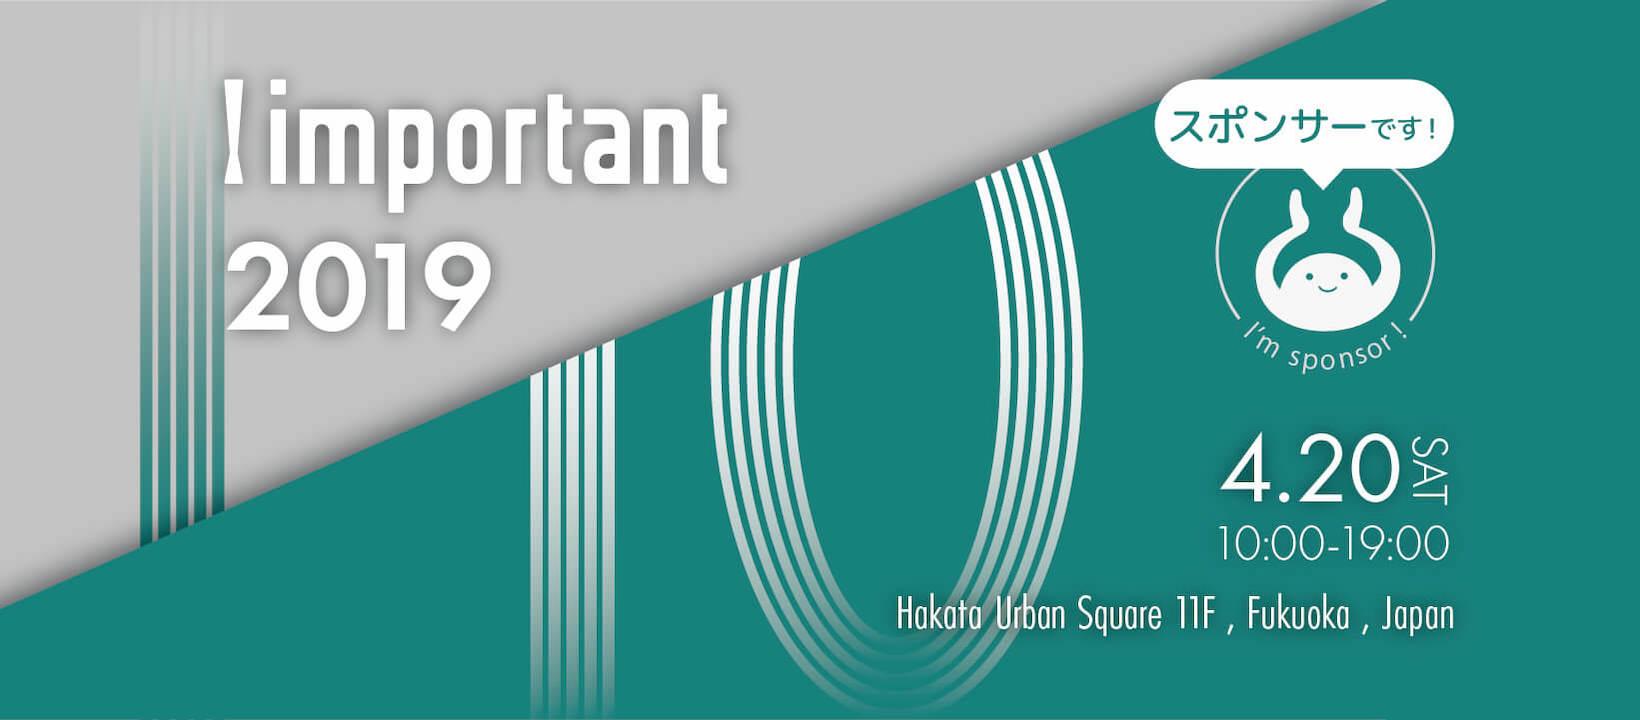 fb-sponsor-important2019-1.jpg